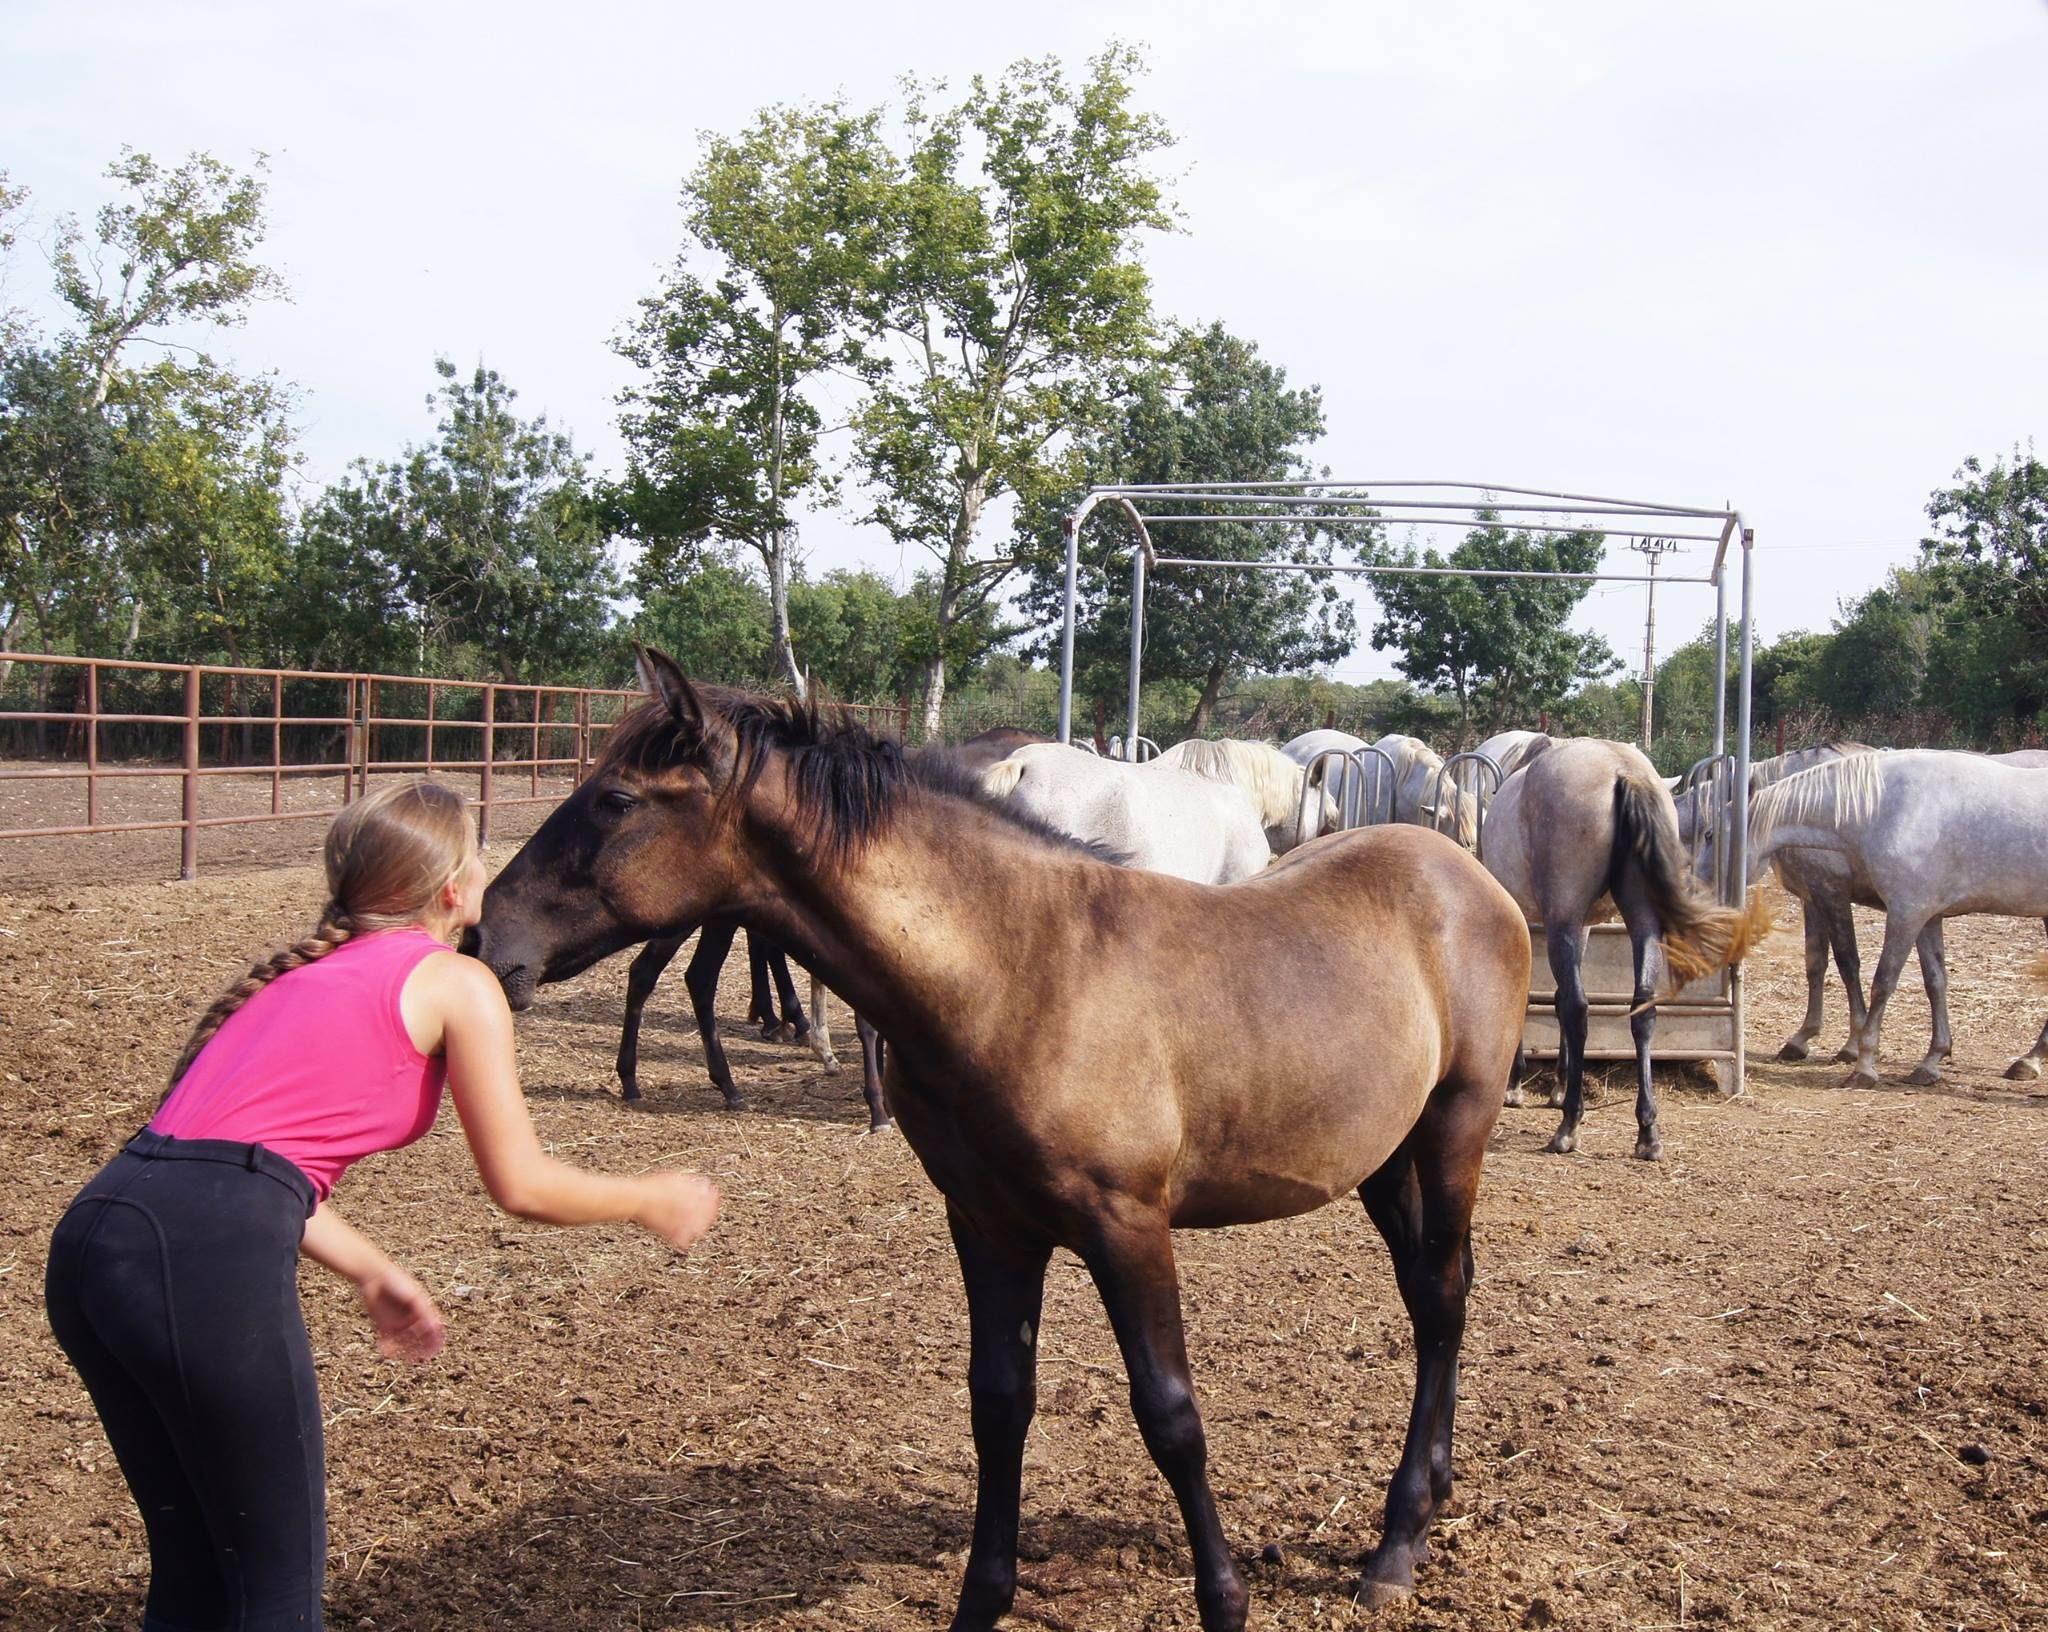 Espectáculos de caballos por toda Cataluña